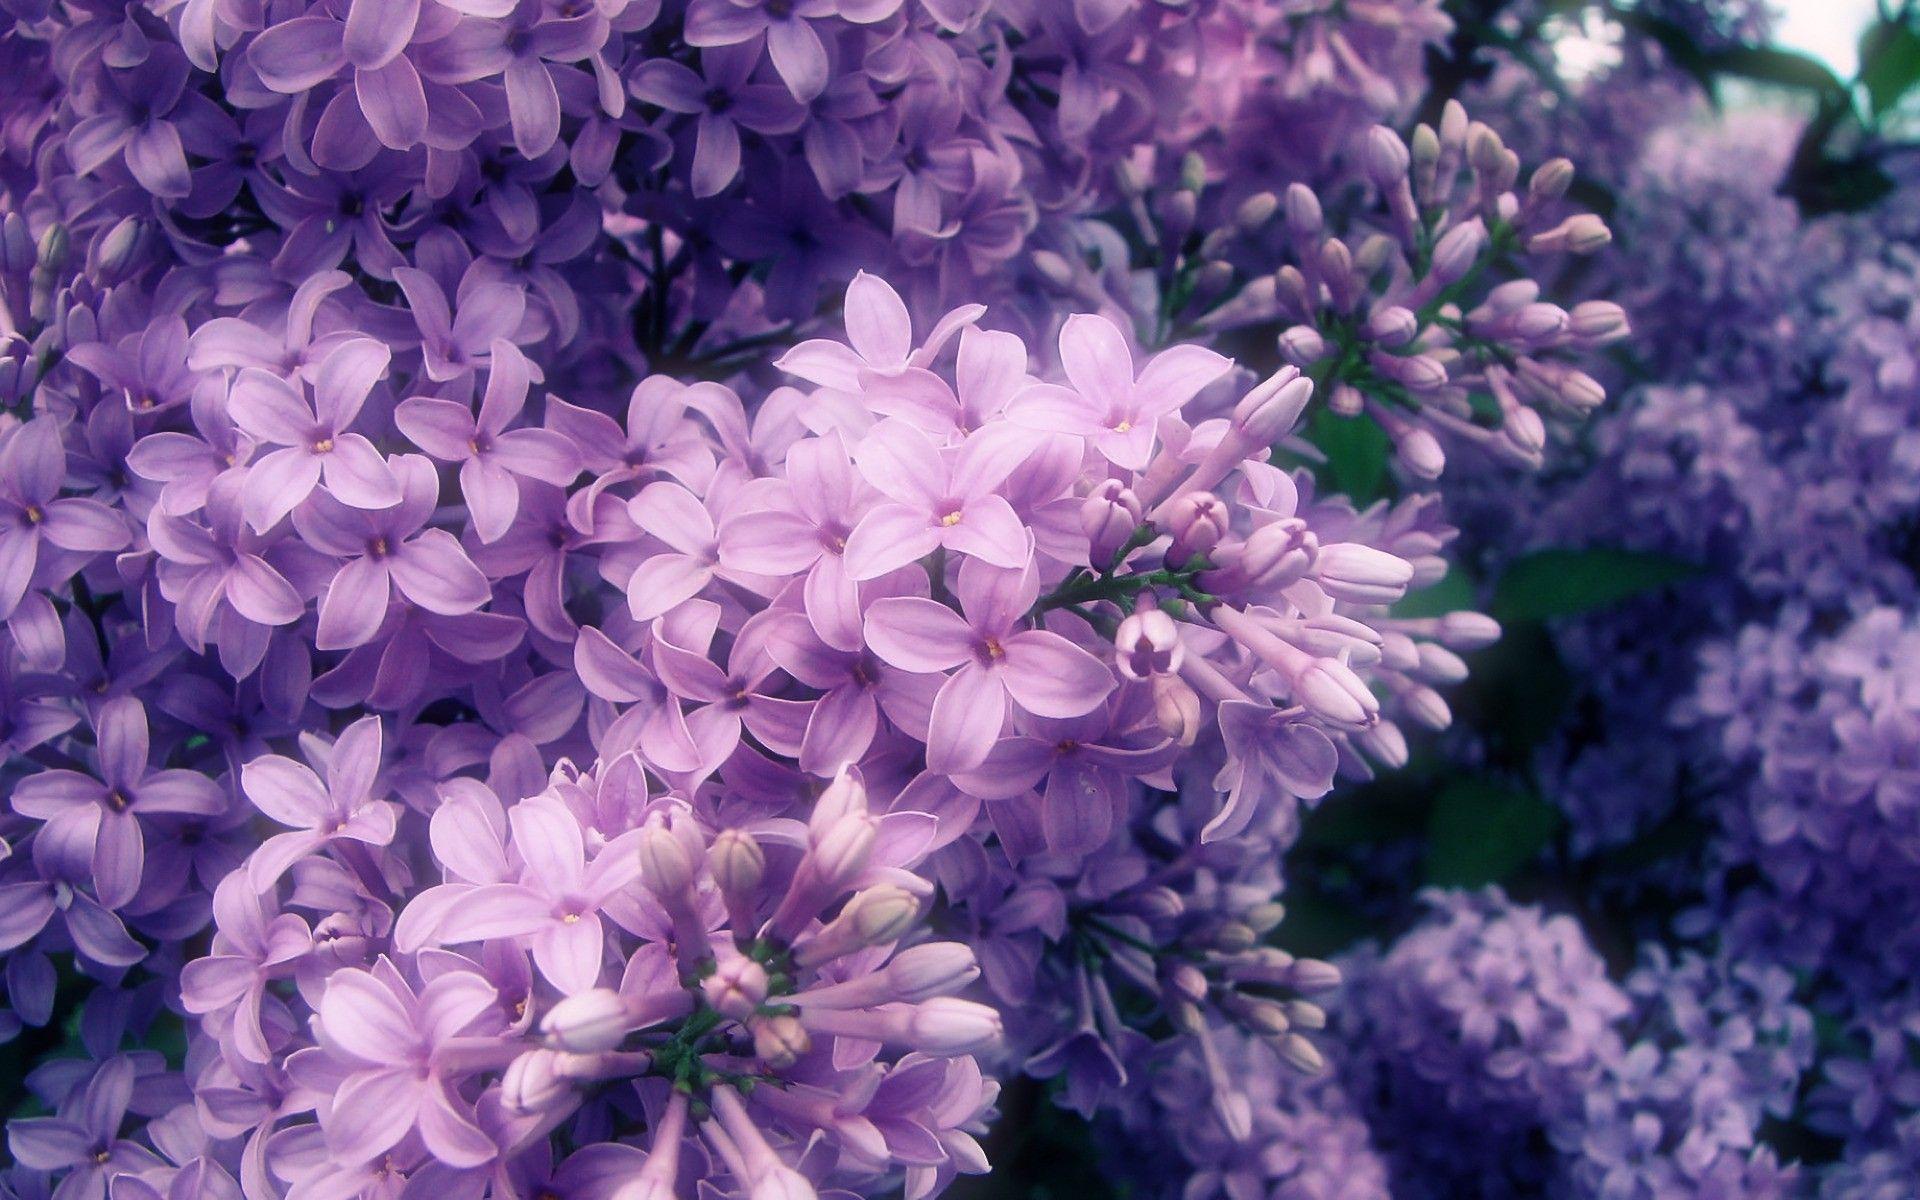 purple flowers wallpaper #145795, flowers Photography ...